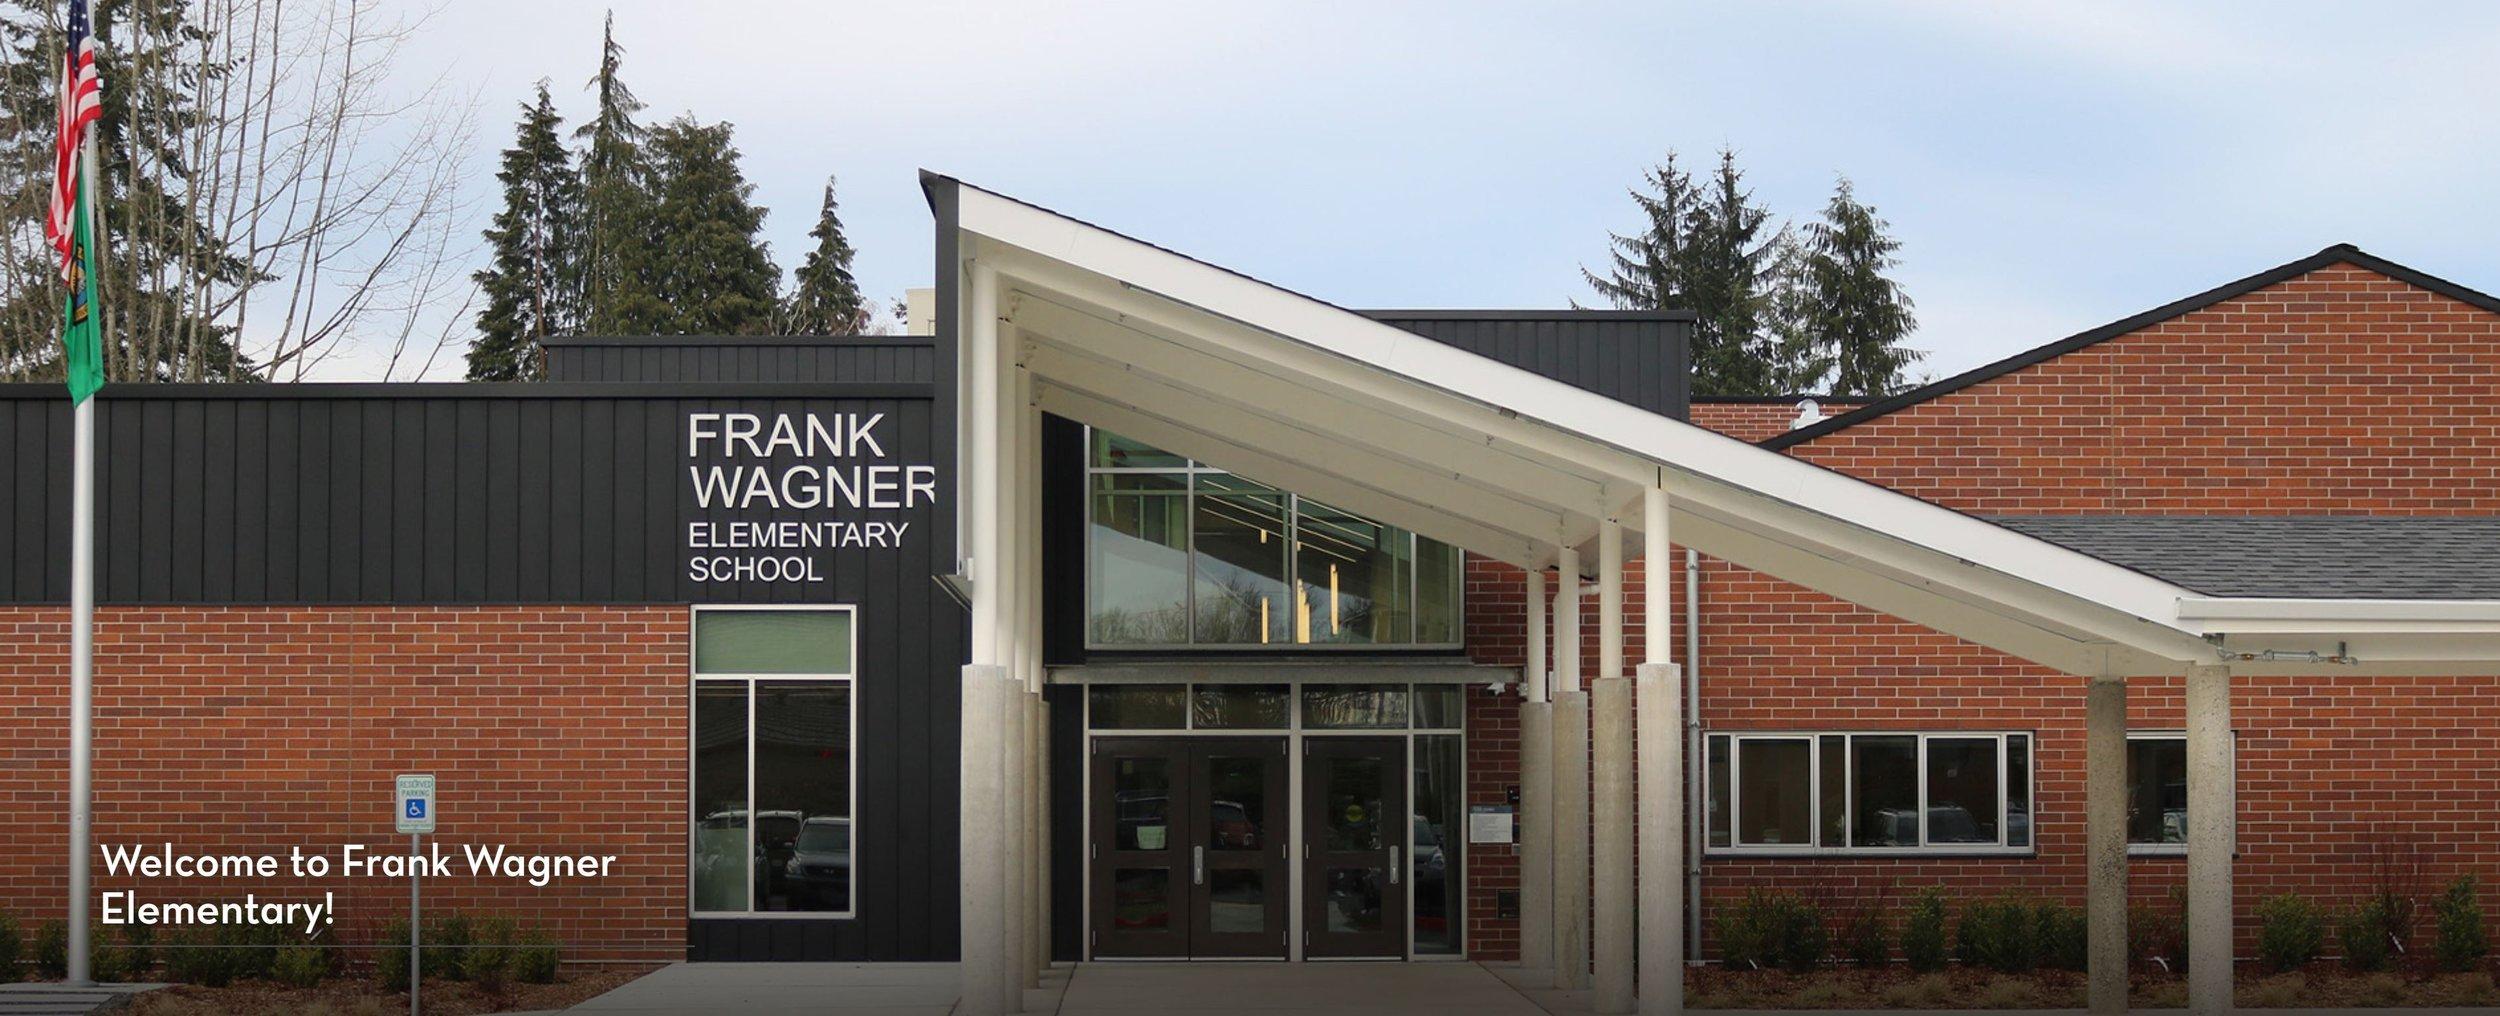 Frank Wagner Elementary School